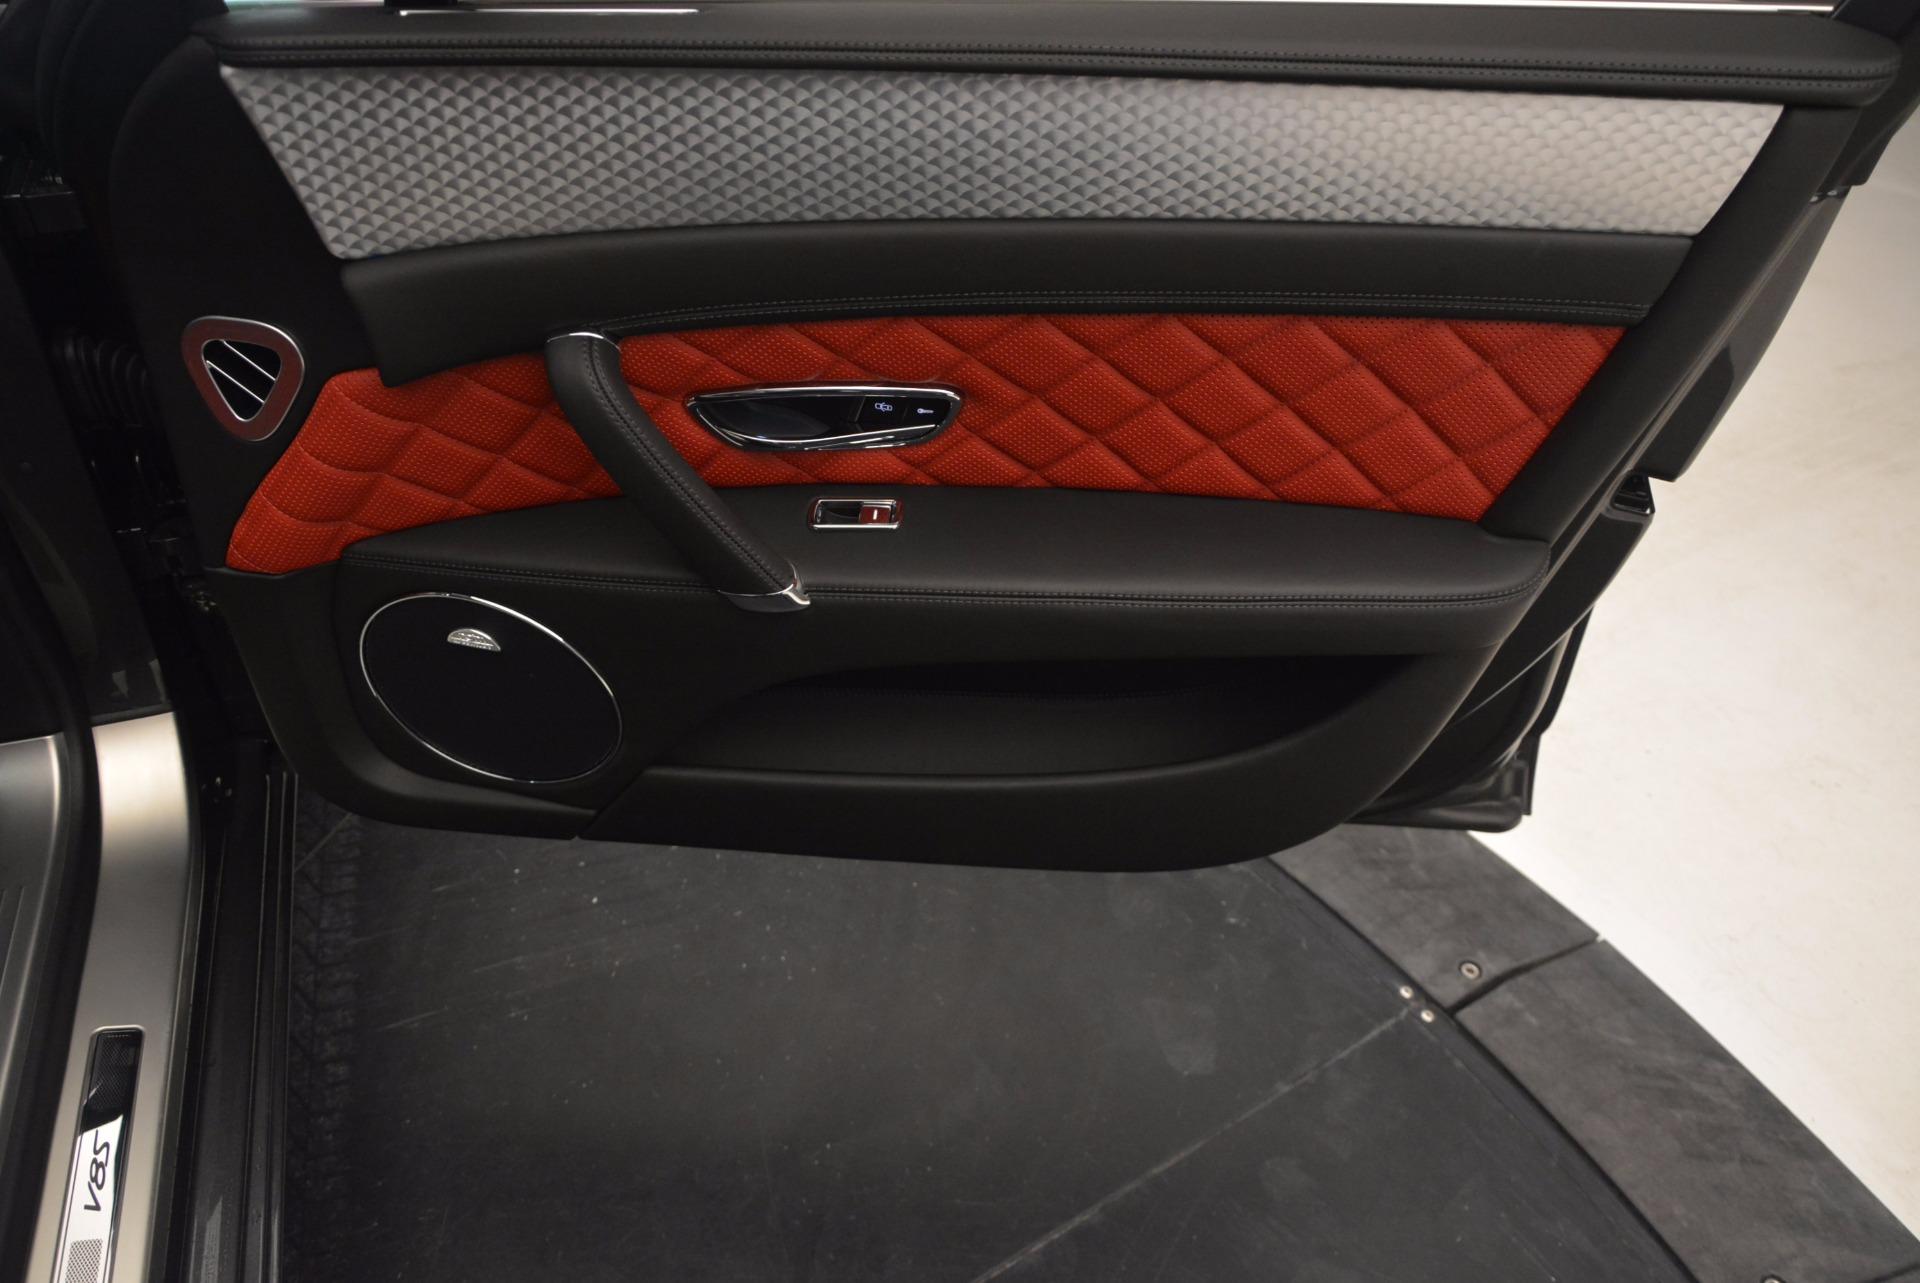 Used 2017 Bentley Flying Spur V8 S For Sale In Westport, CT 875_p43